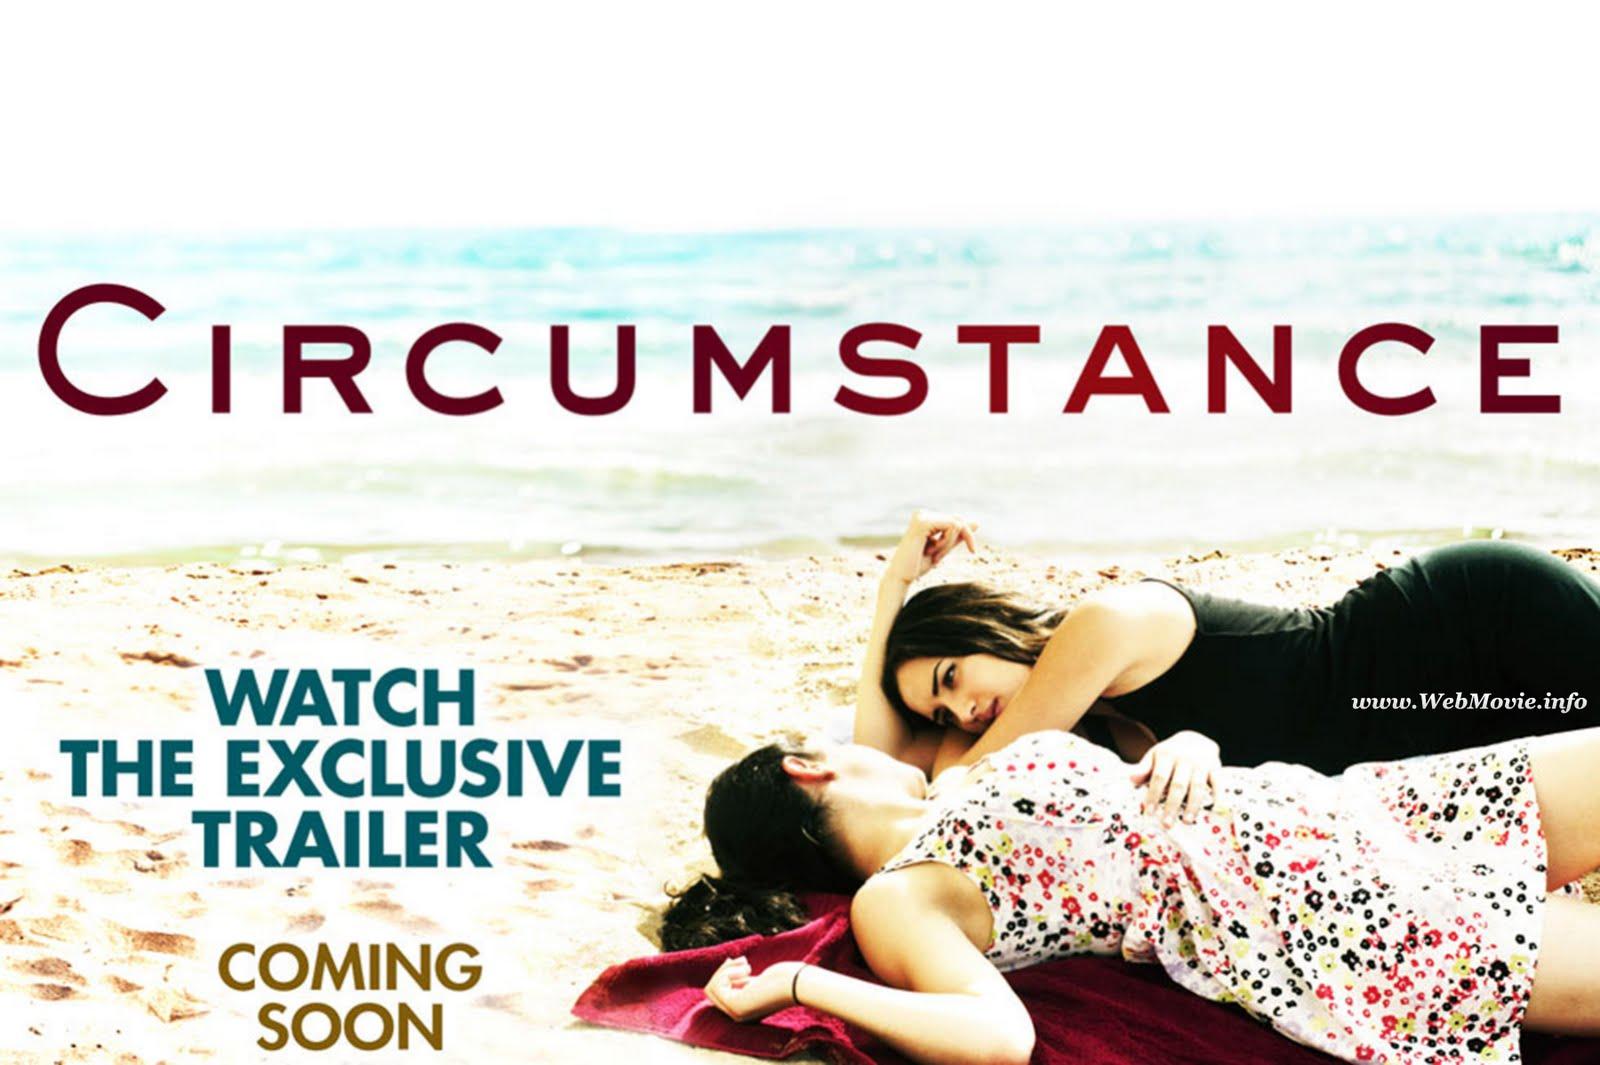 watch full movie online free: Watch Full Movie ...